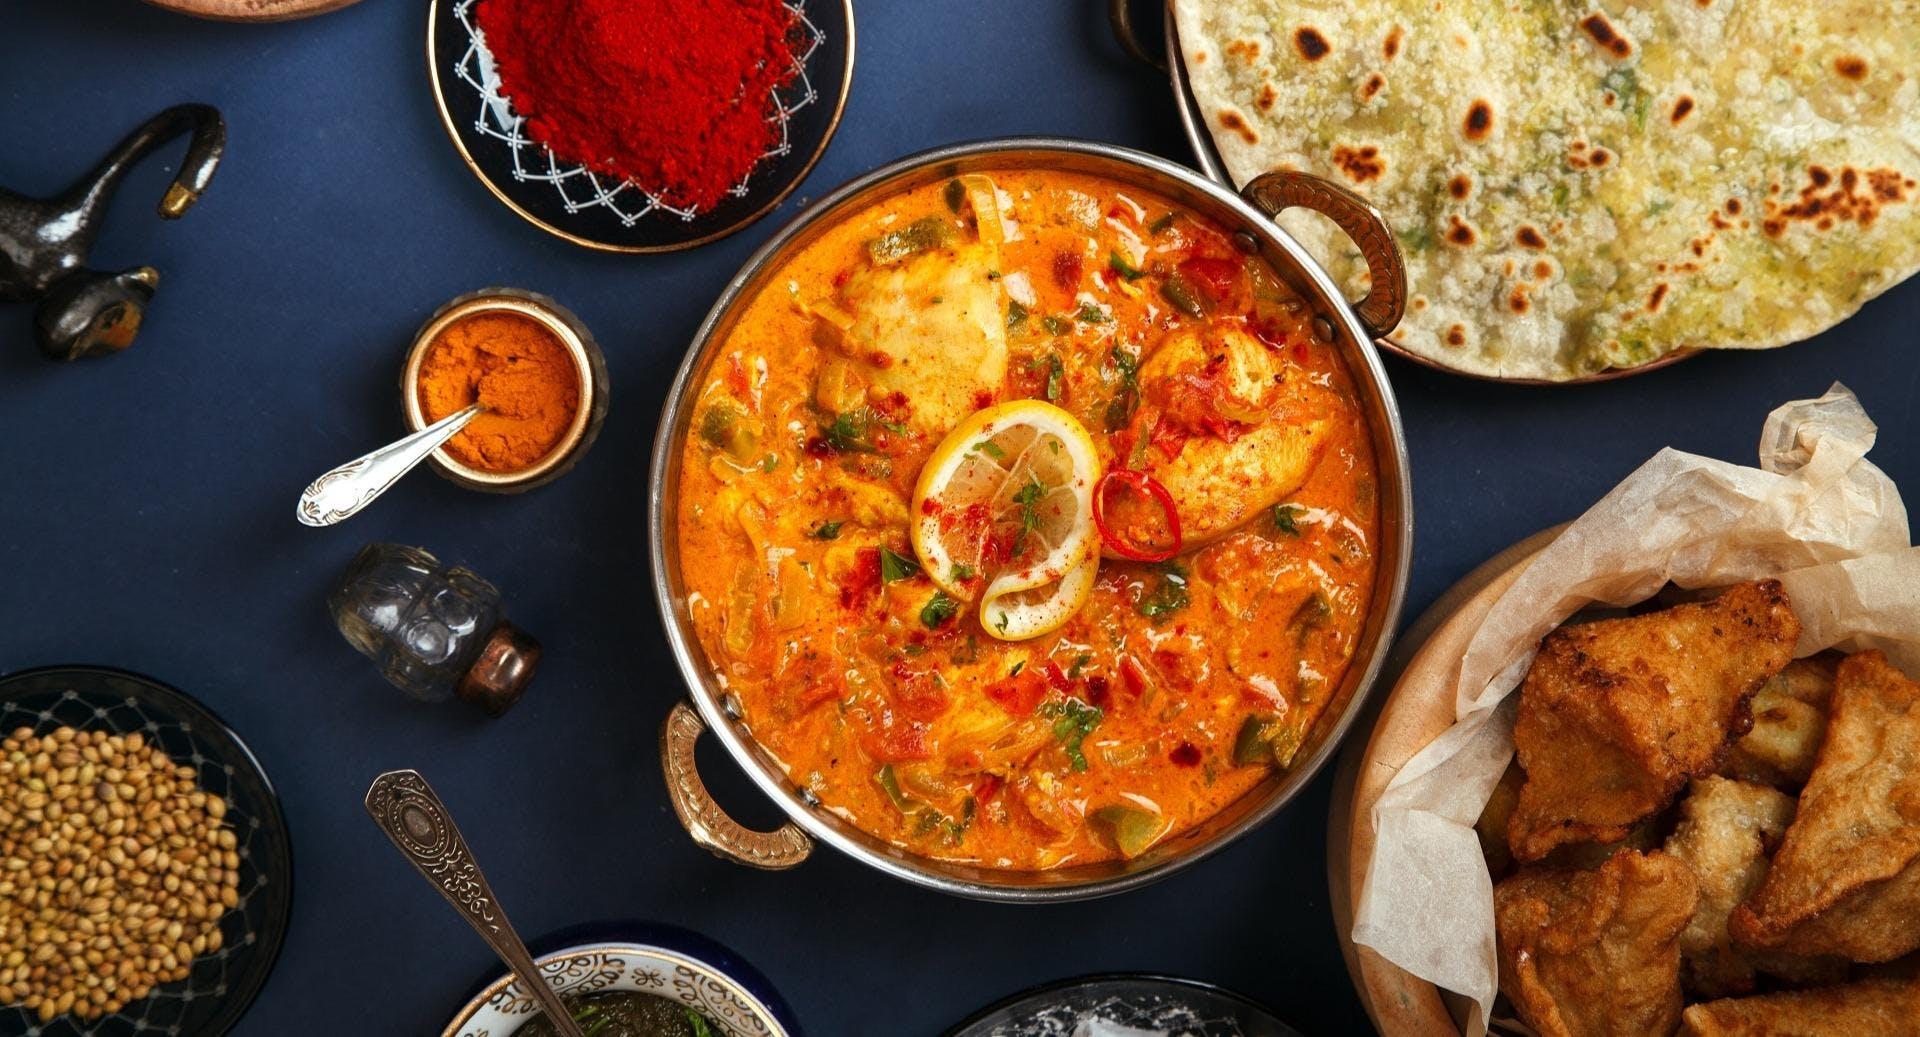 Jaipur Indian Restaurant Cologne image 2